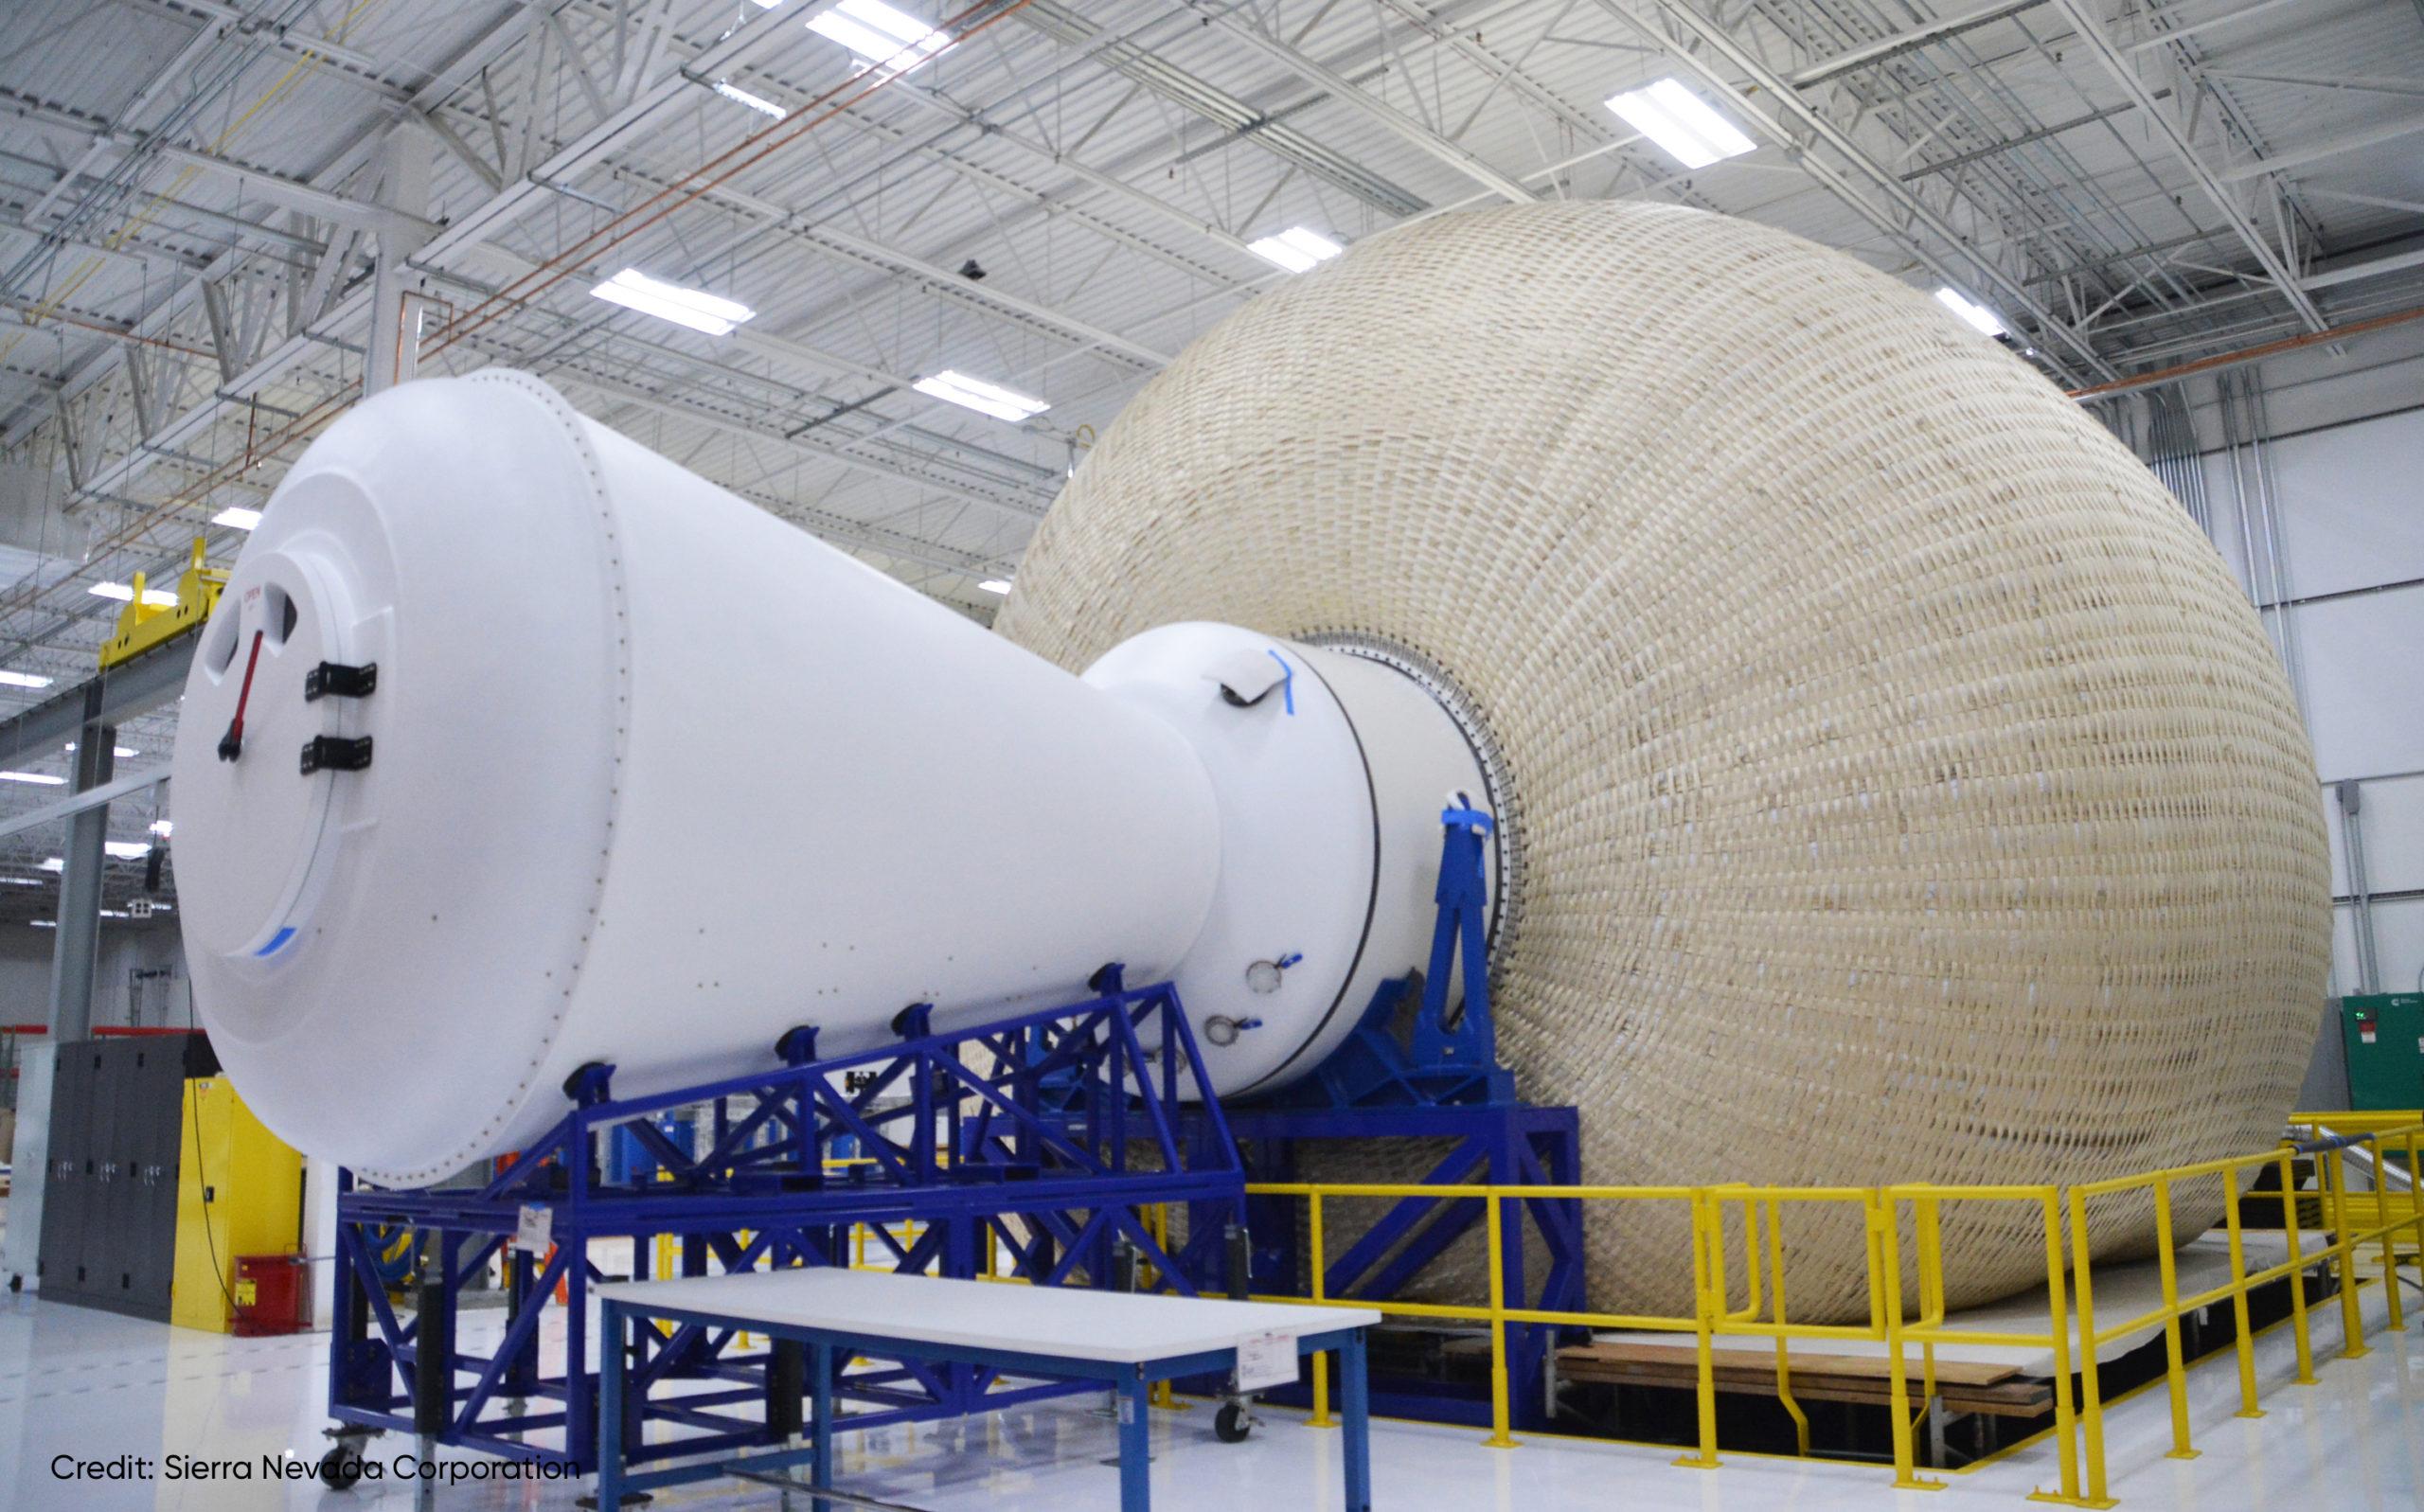 Inflatable Lunar Gateway Undergoes Testing at NASA